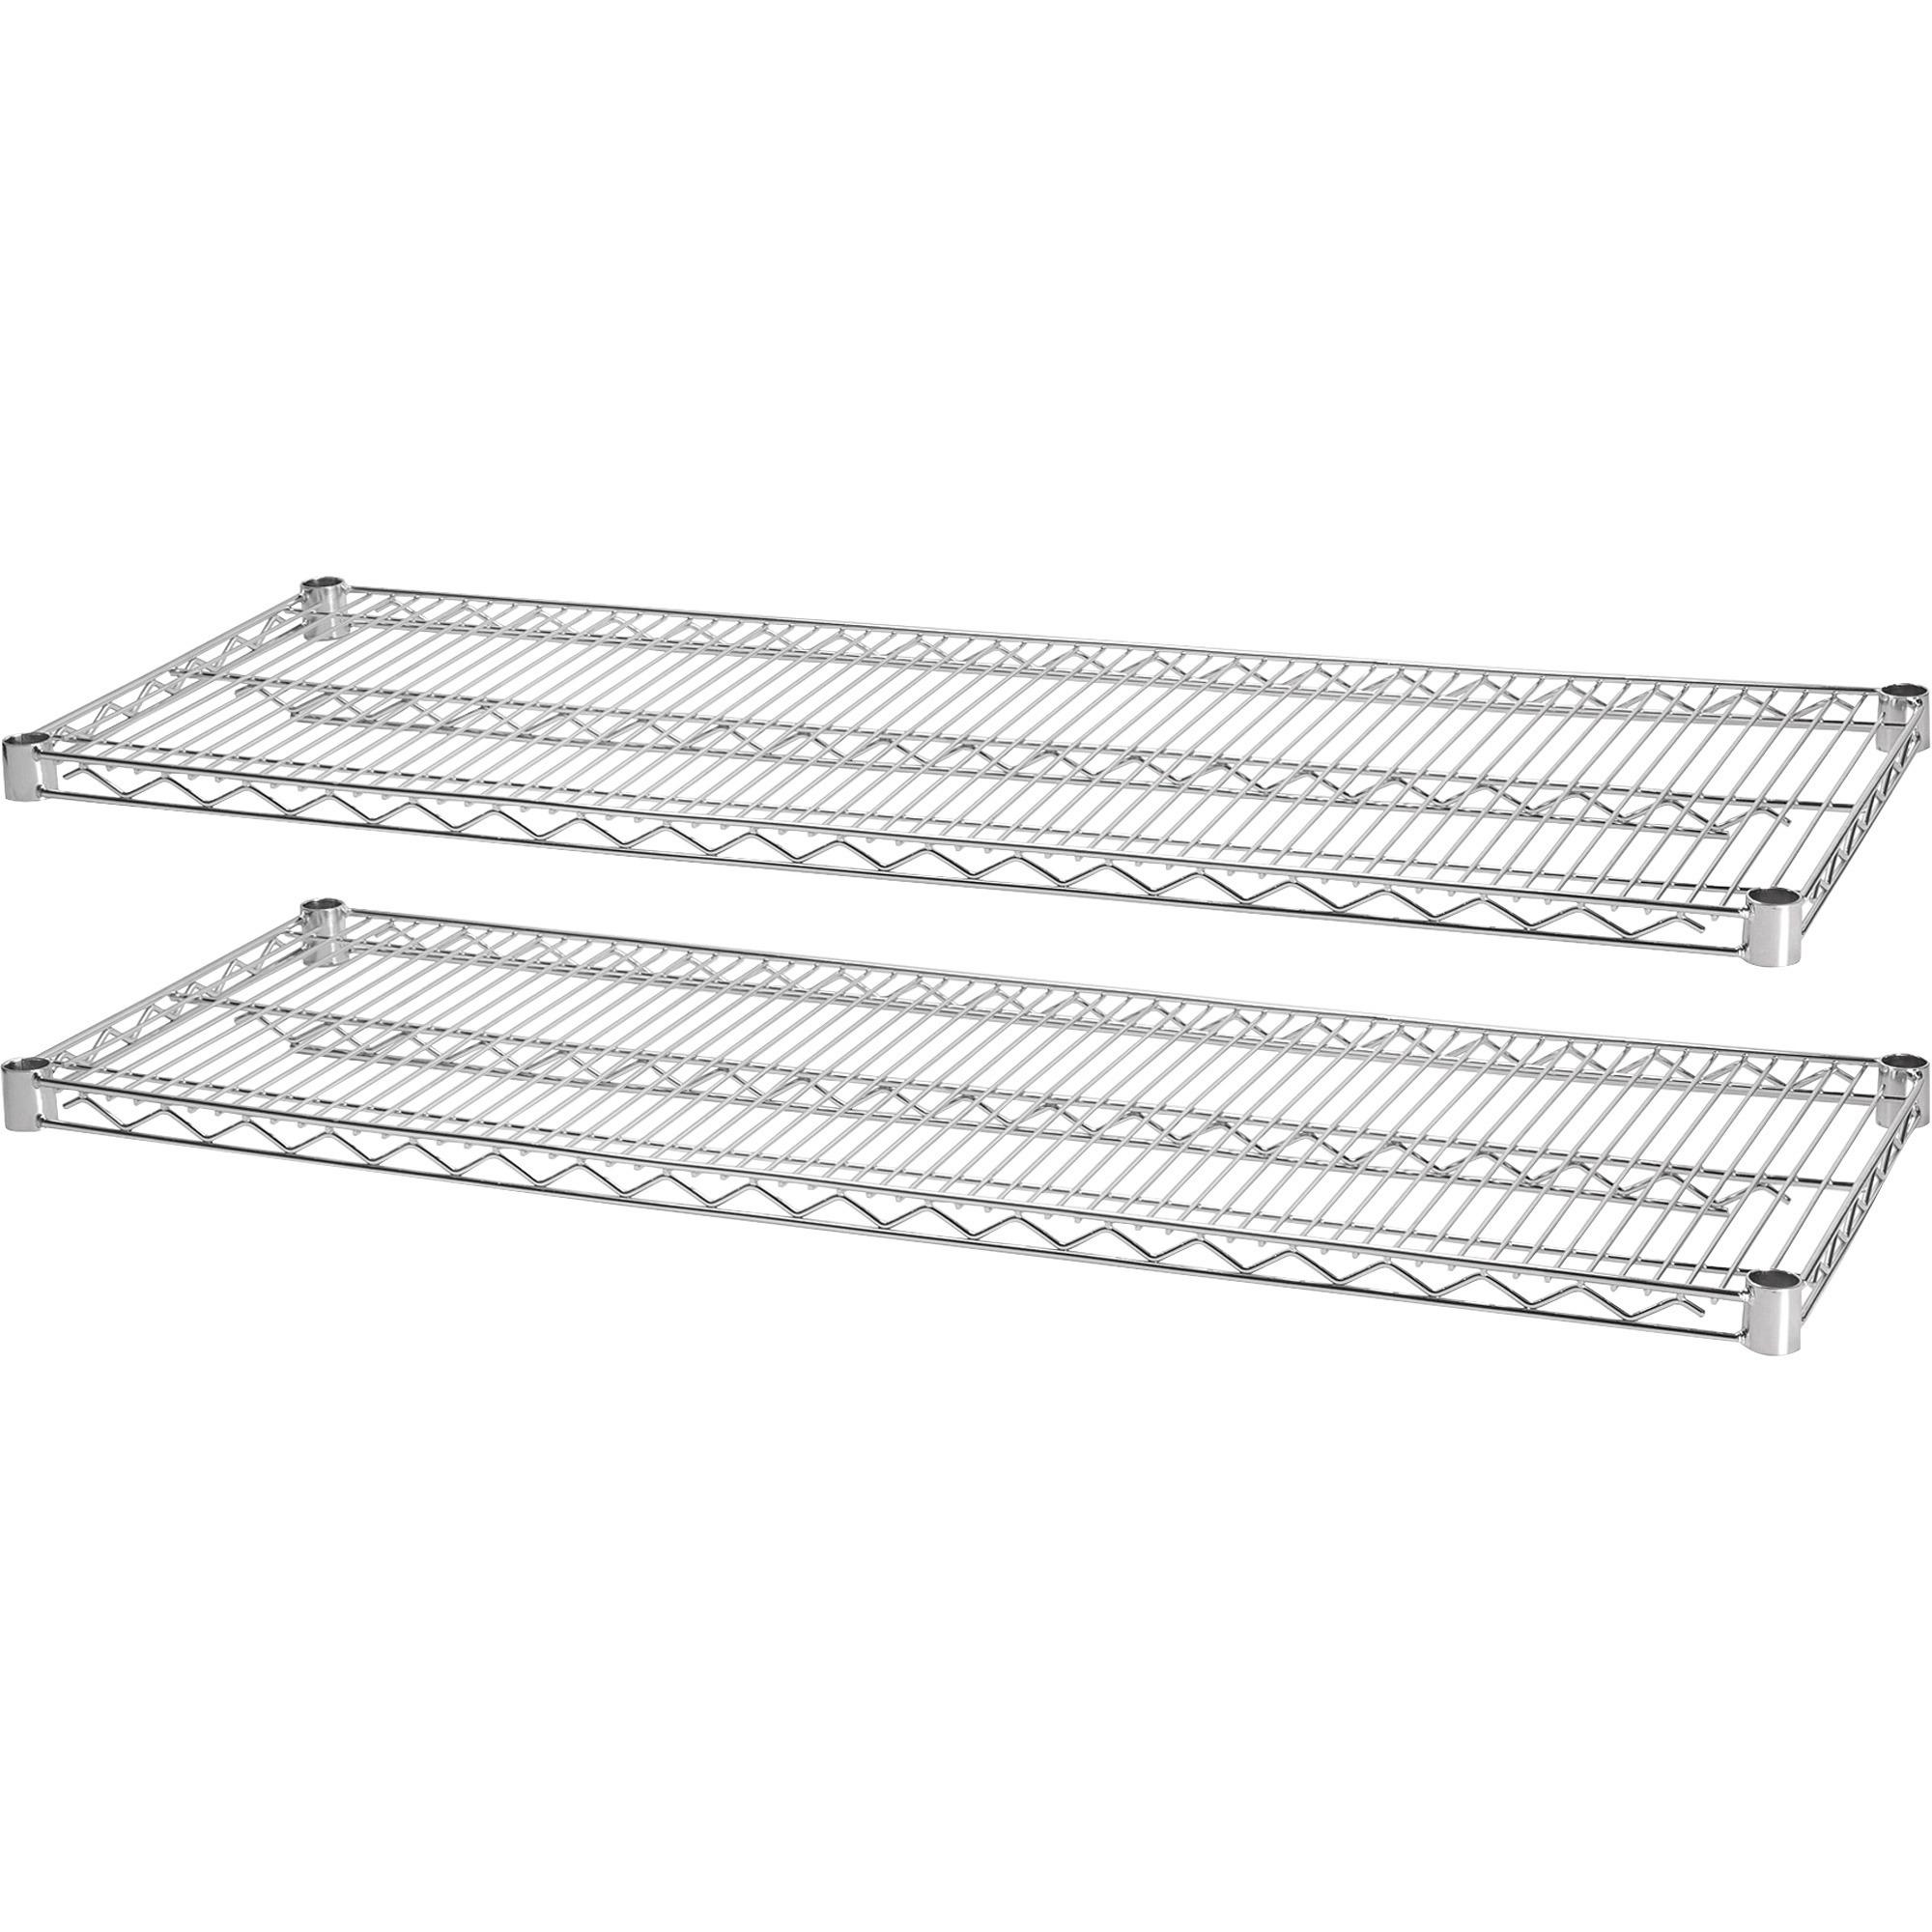 Lorell Indust Wire Shelving Starter Extra Shelves Llr